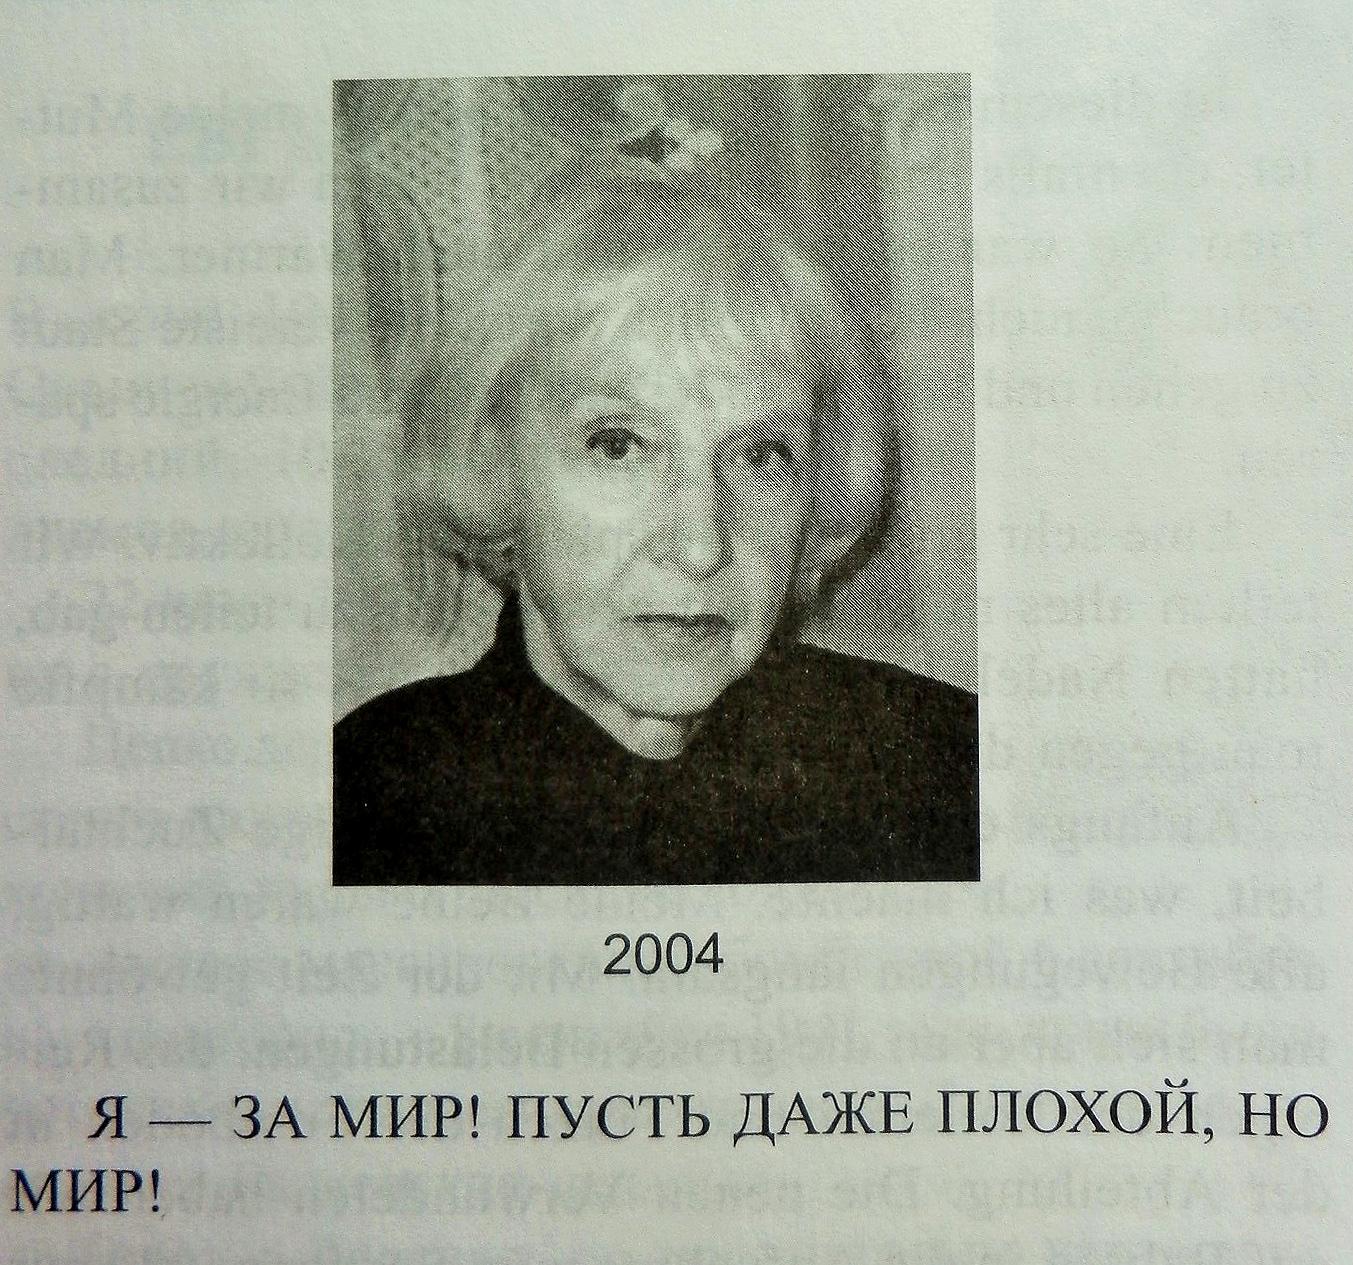 Евгения Рудник, фото 2004 года